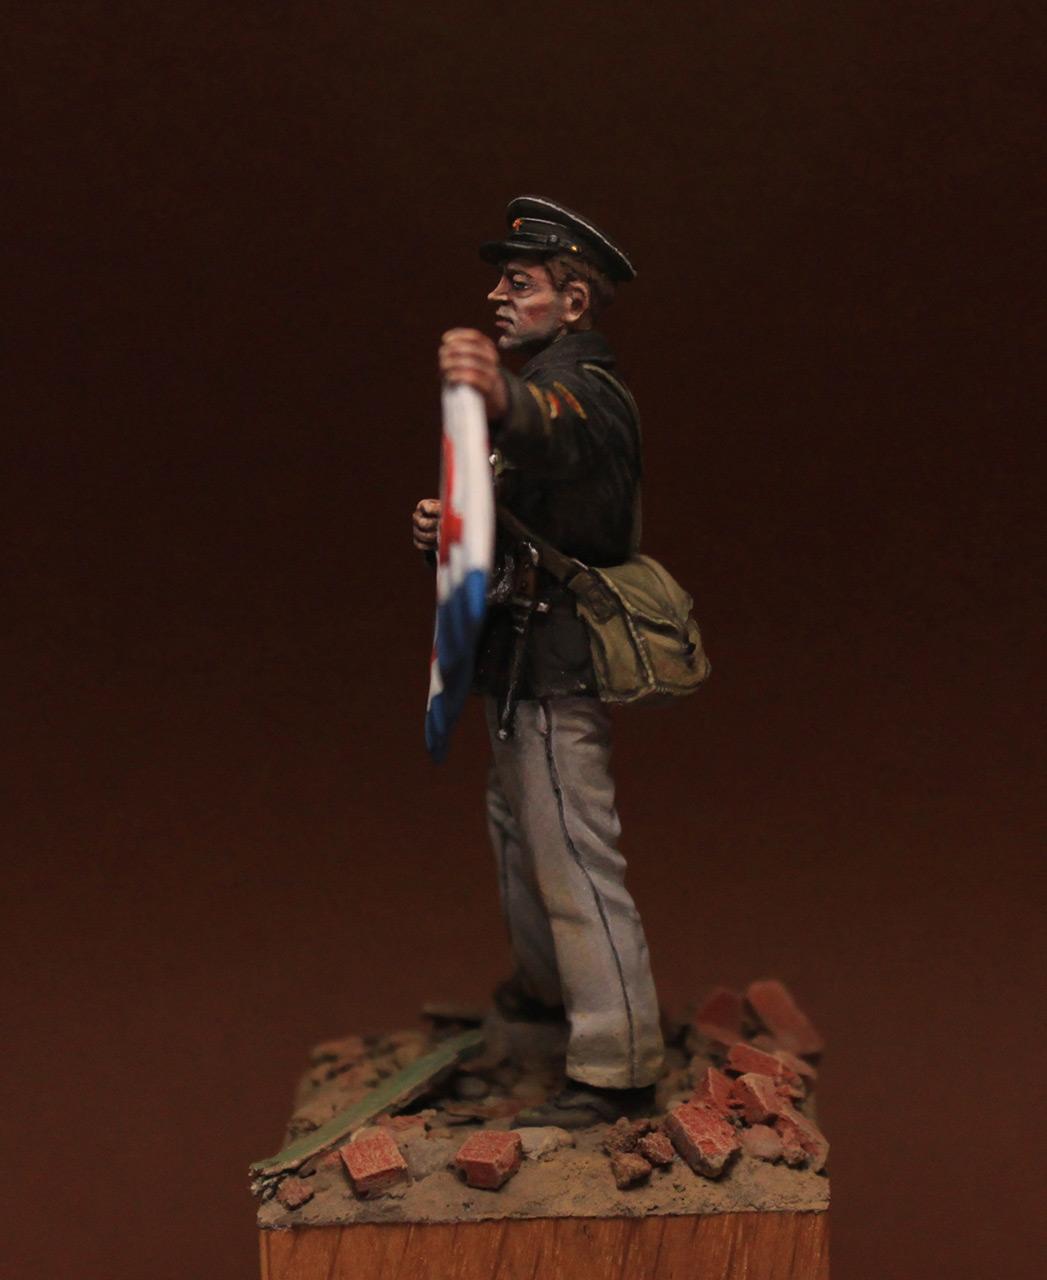 Figures: Petty officer 1st class, Soviet marines, 1942, photo #7